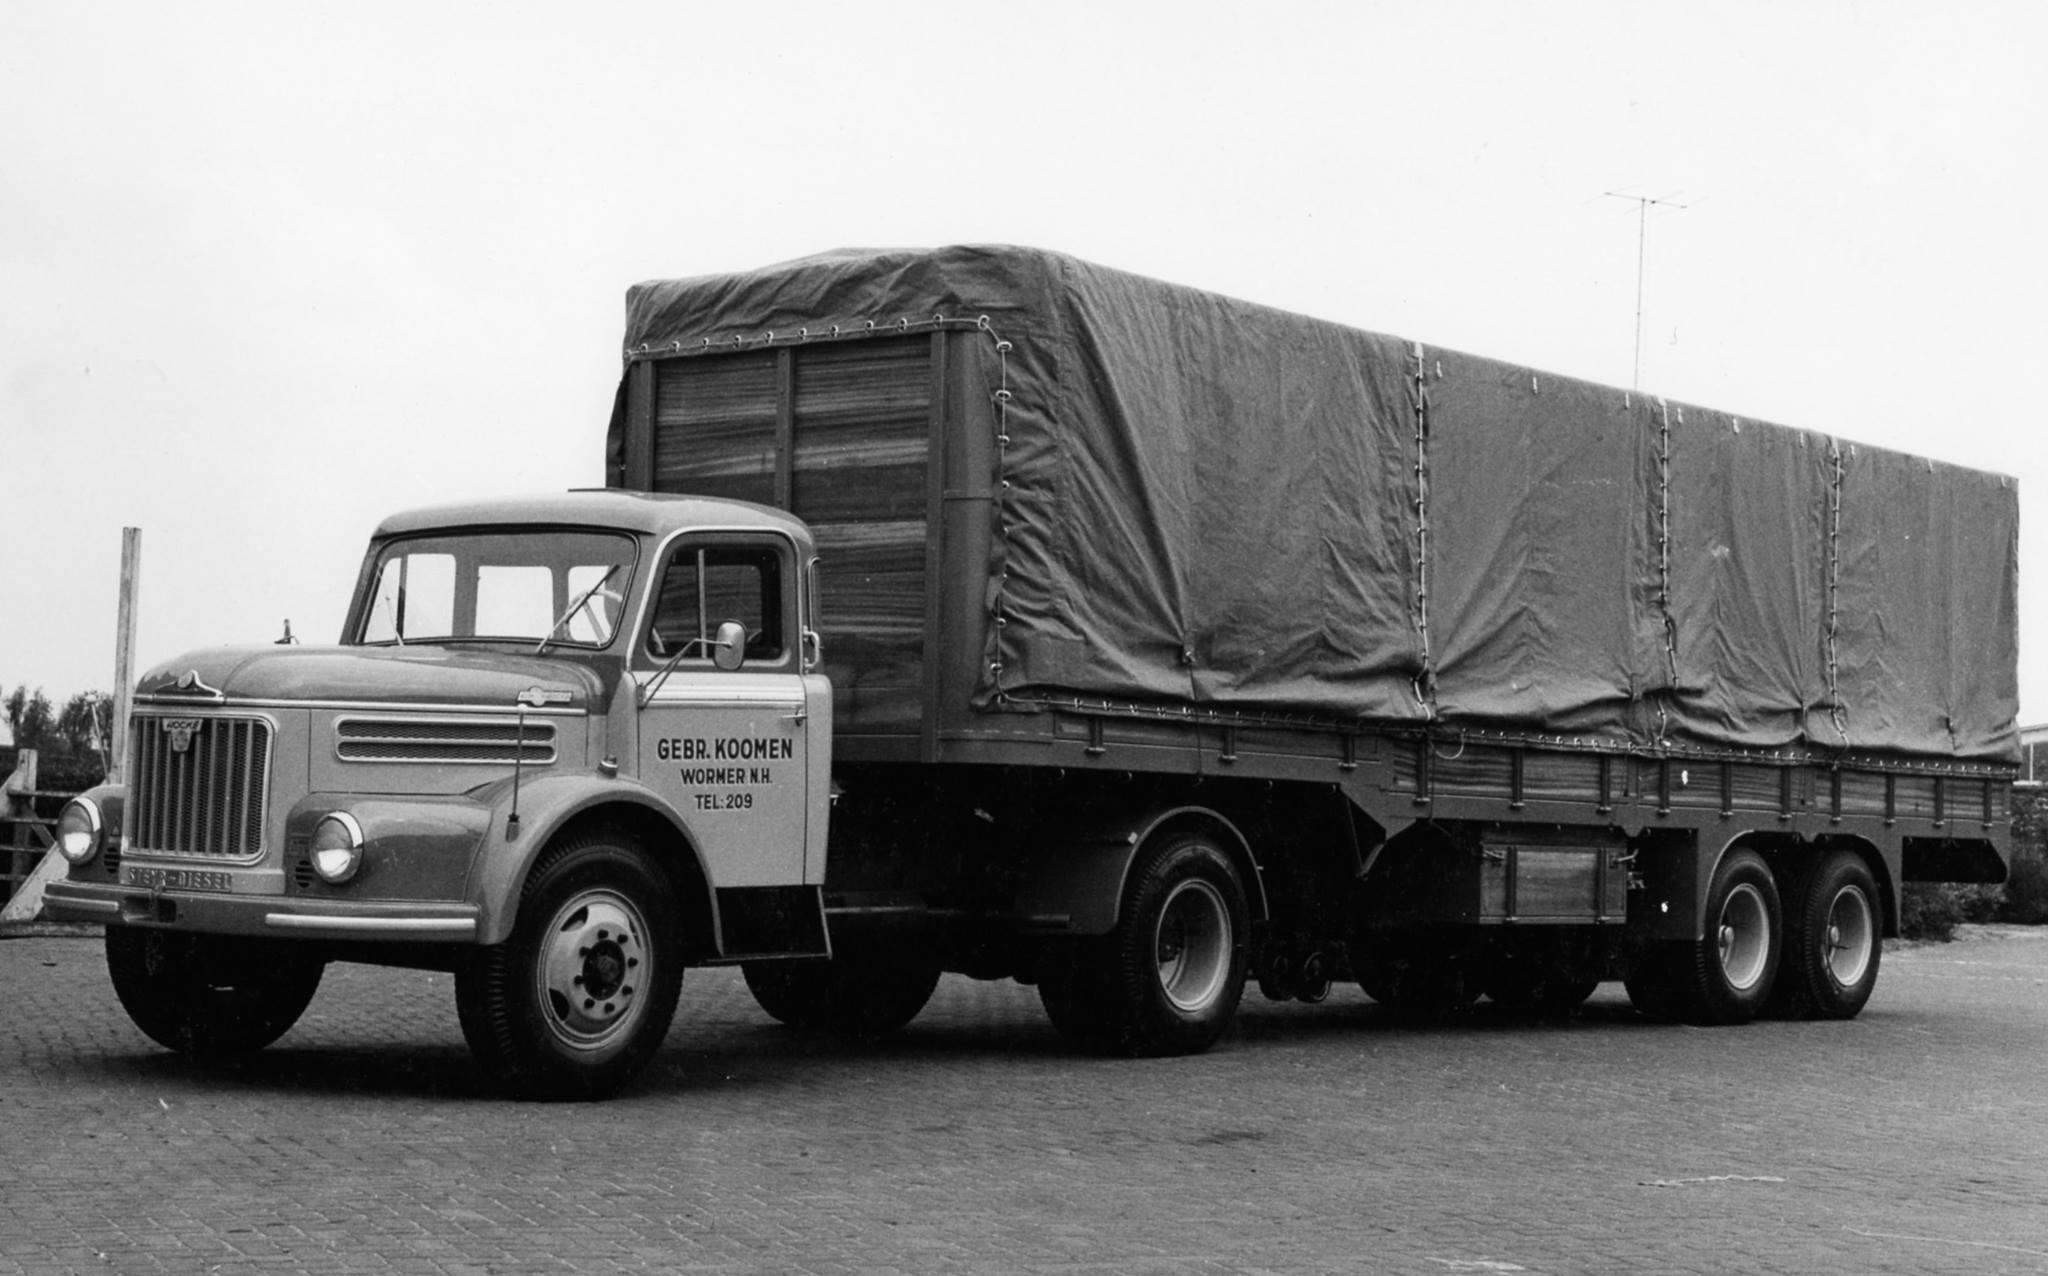 1965-Steyr-Hocke-586-Gebr-Koomen-Wormer-Lens-oplegger-Collectie-Pieter-Lensselink[1]